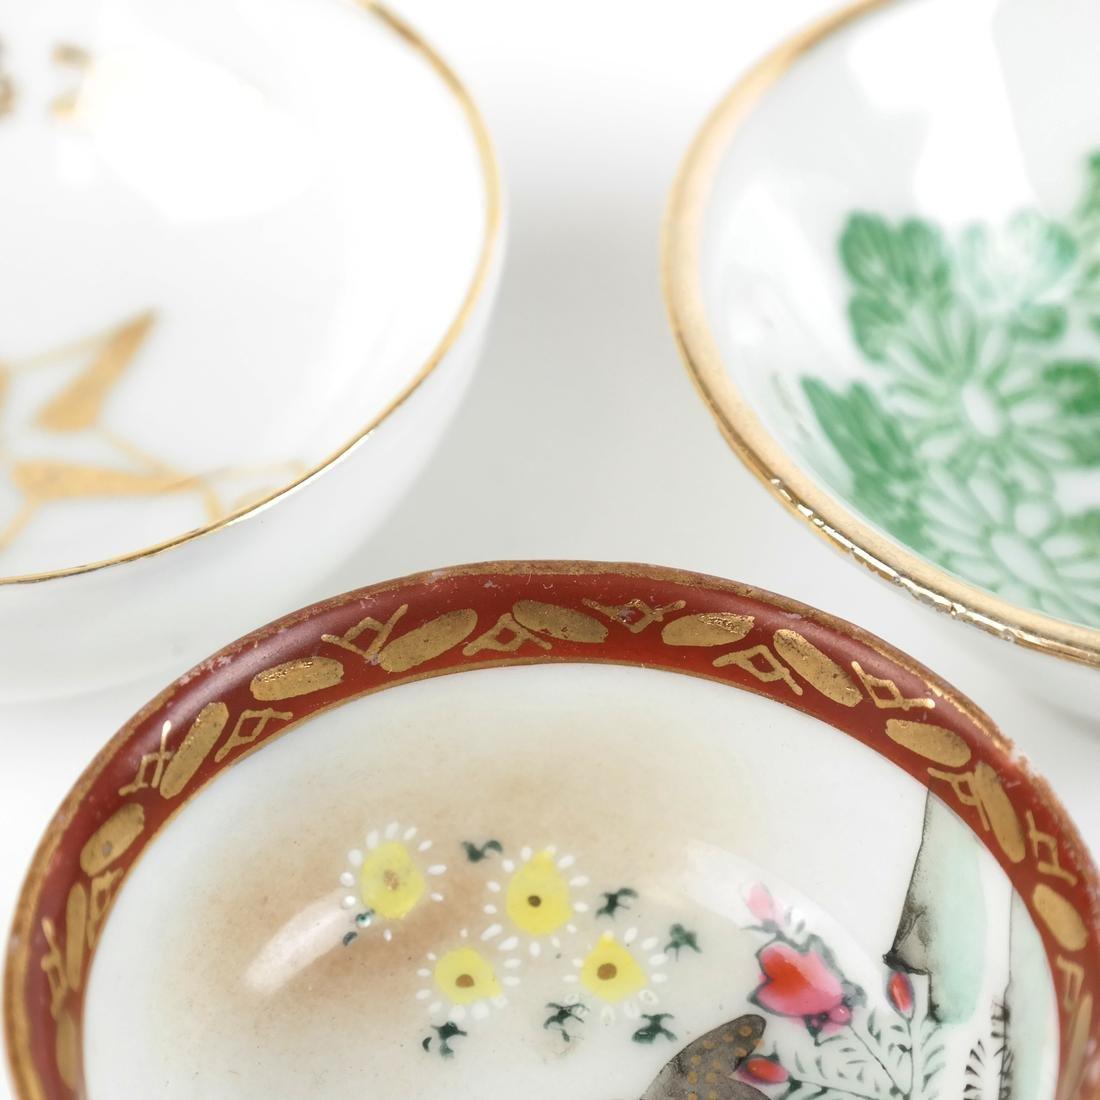 Five Japanese Porcelain Items - 7